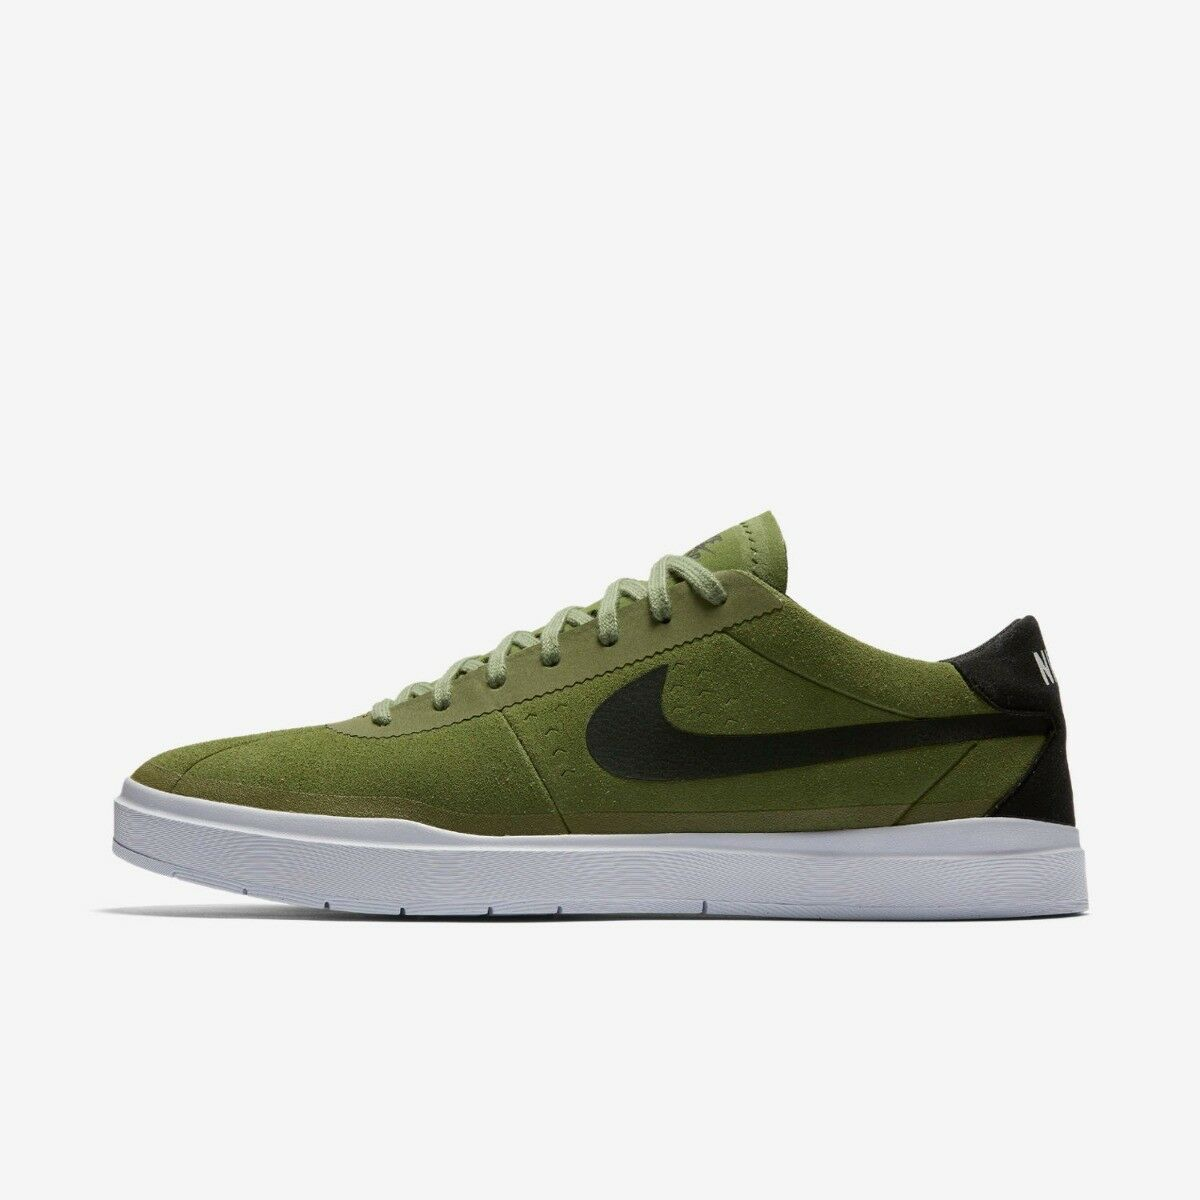 NIKE SB Bruin Hyperfeel 831756300 Scarpa Da Skate Sneaker Tempo Libero Scarpa Lifestyle